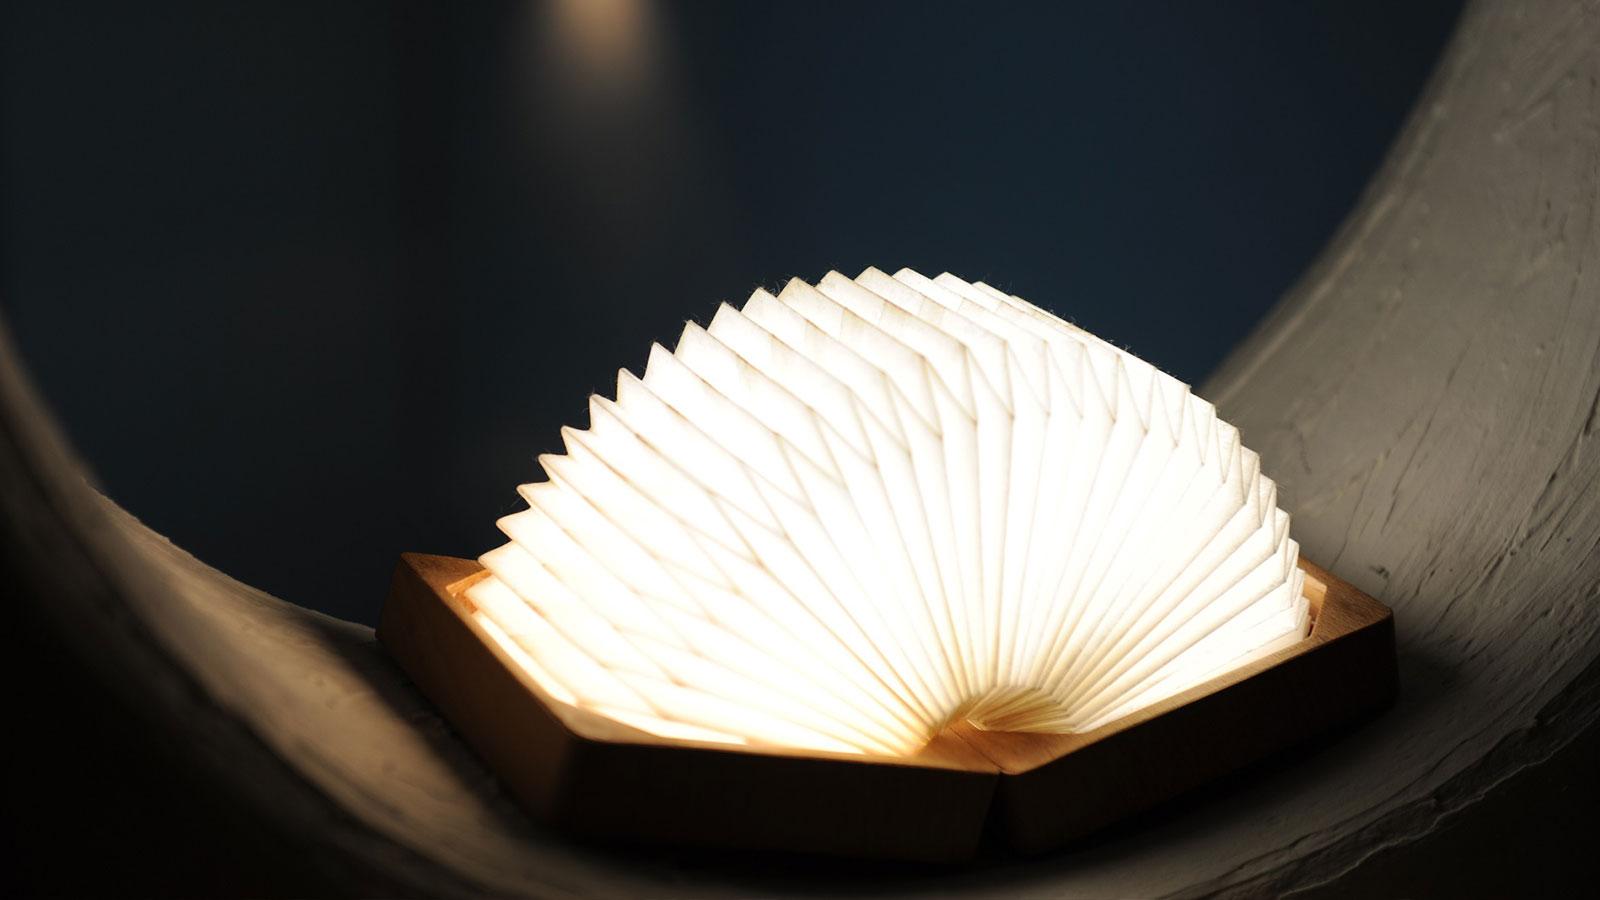 Orilamp Smart Origami Lamp That Brings Back Childhood